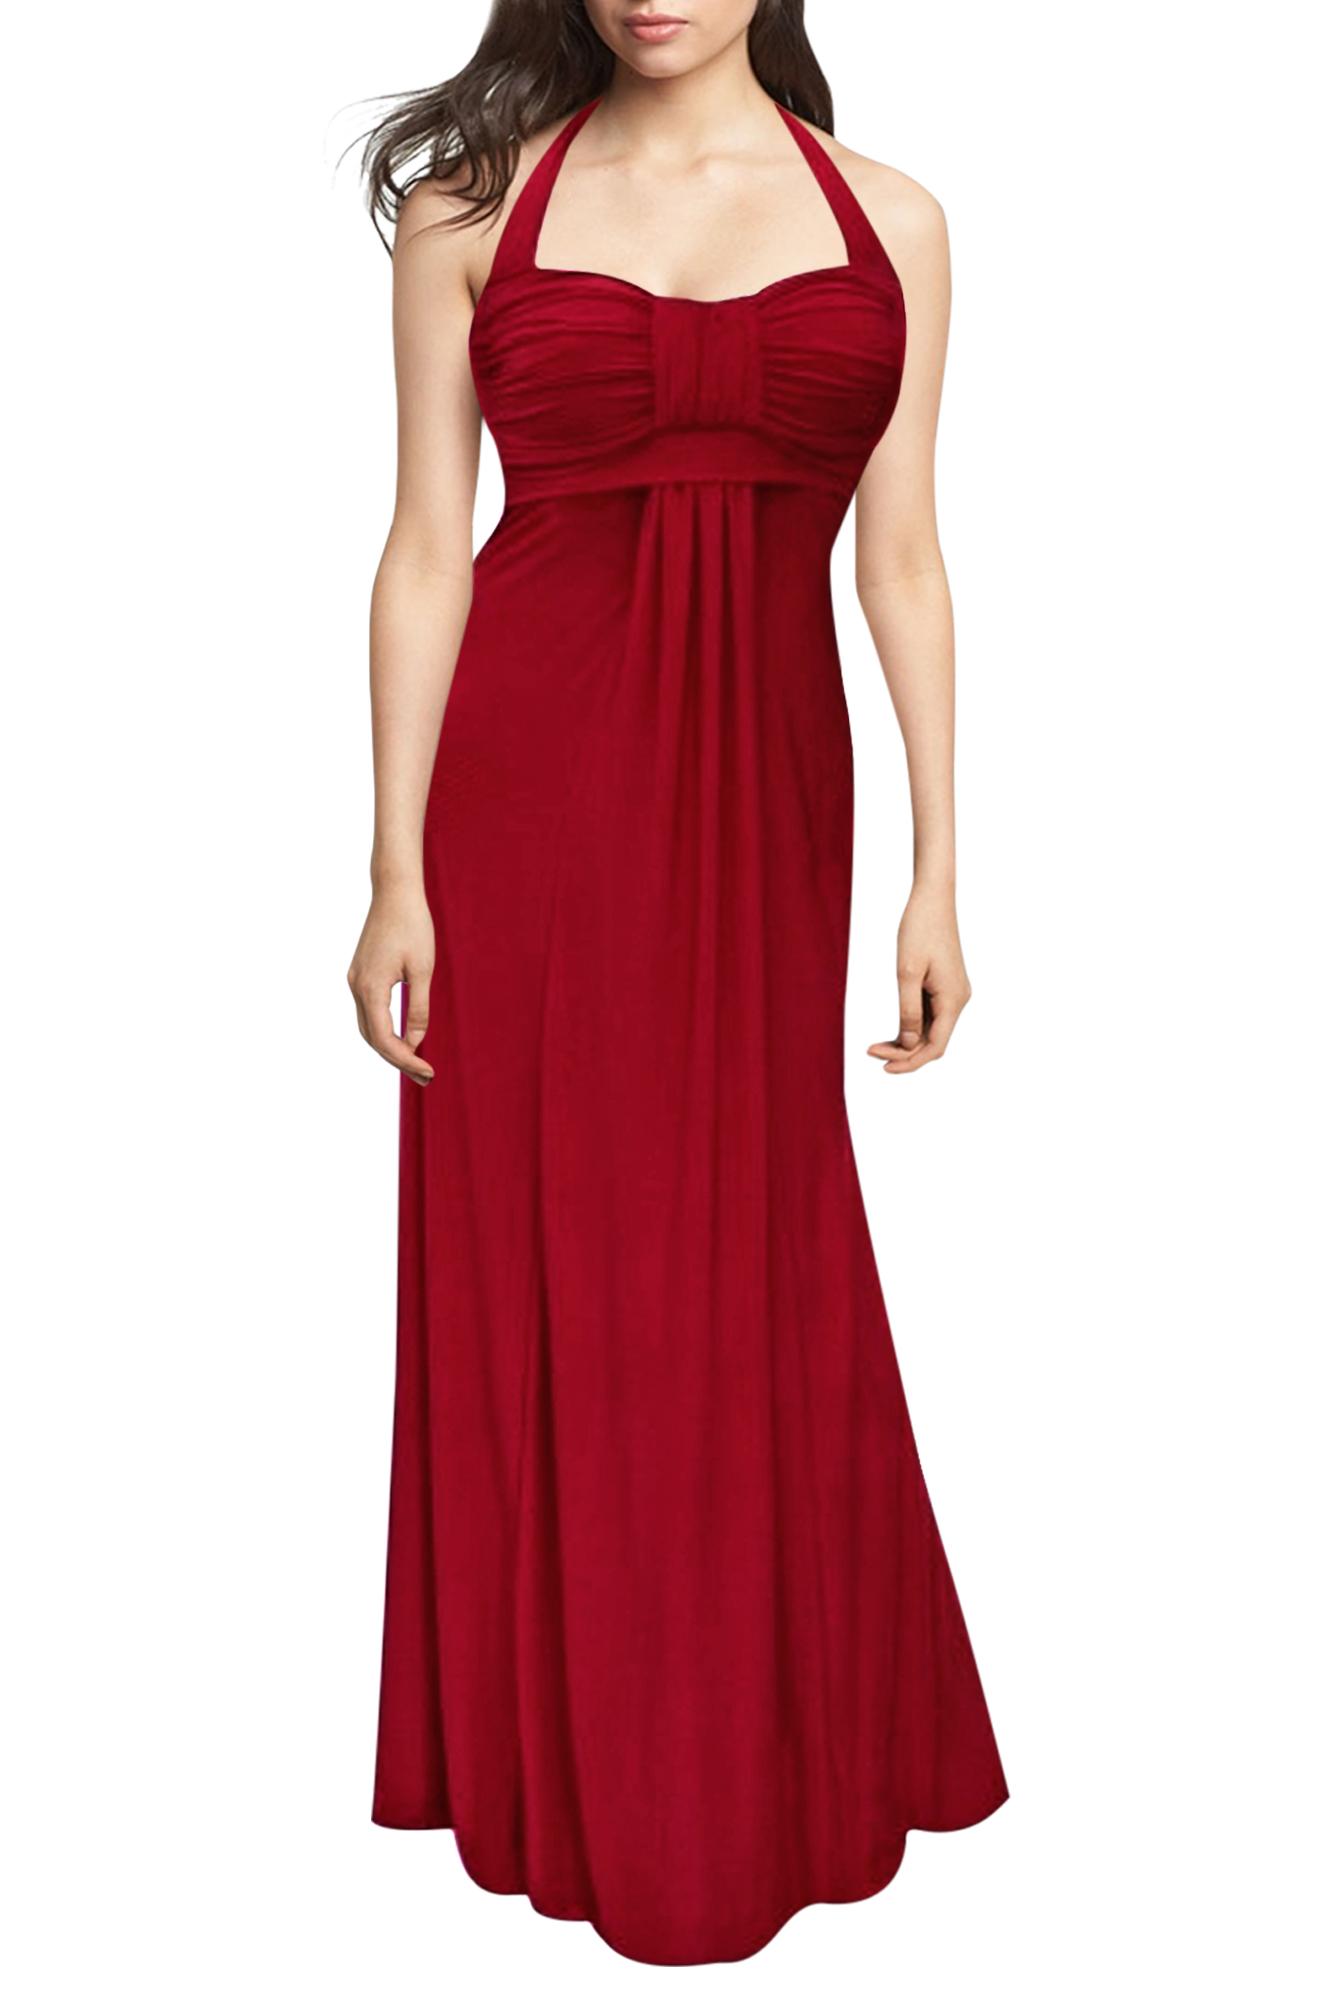 Long elegant wedding evening prom maxi dress size 12 24 for Shoes for maxi dress wedding